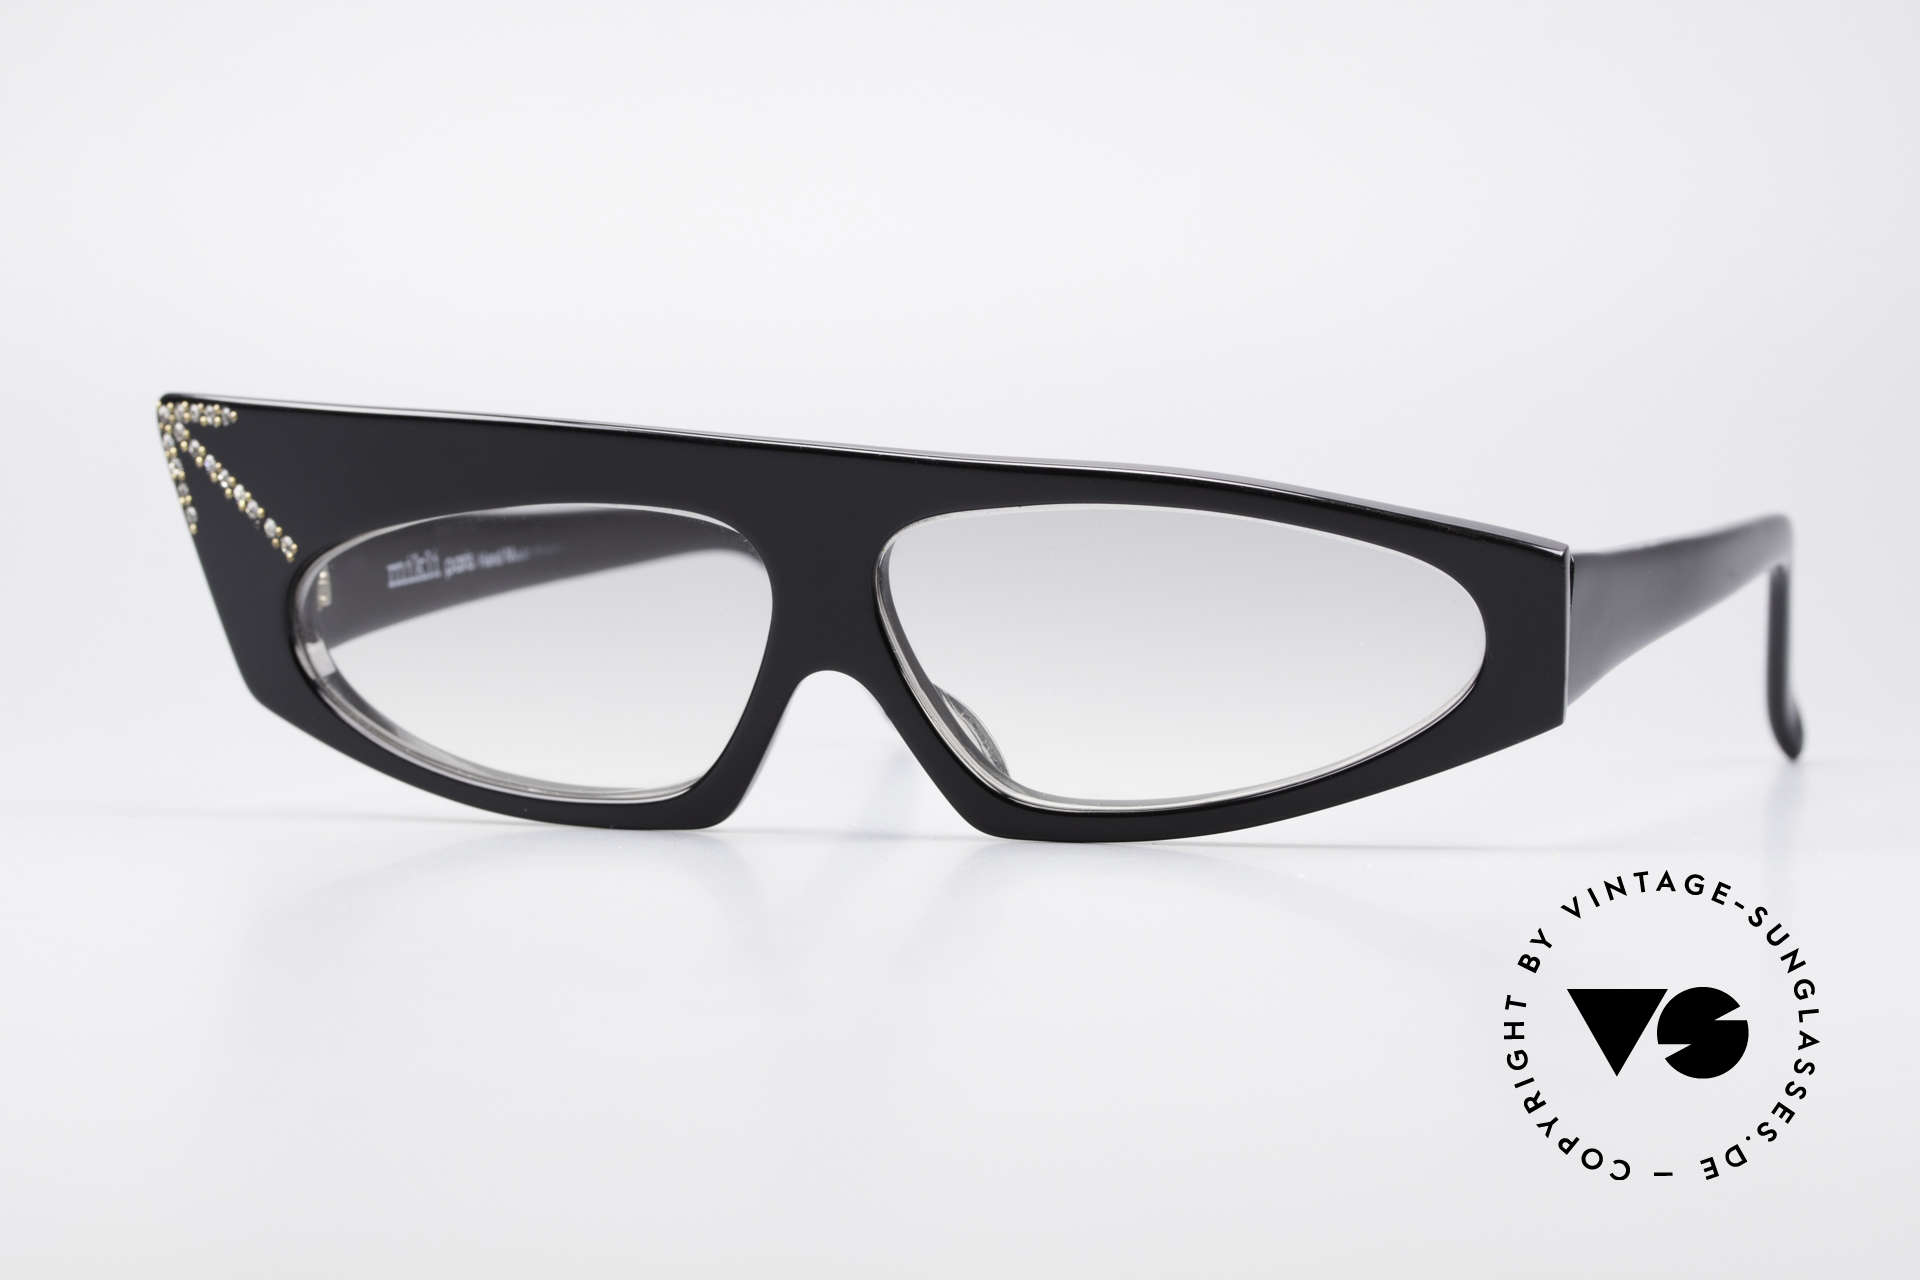 Alain Mikli 305 / 101 80's Haute Couture Sunglasses, asymmetrical Alain Mikli Paris vintage 'art sunglasses', Made for Women